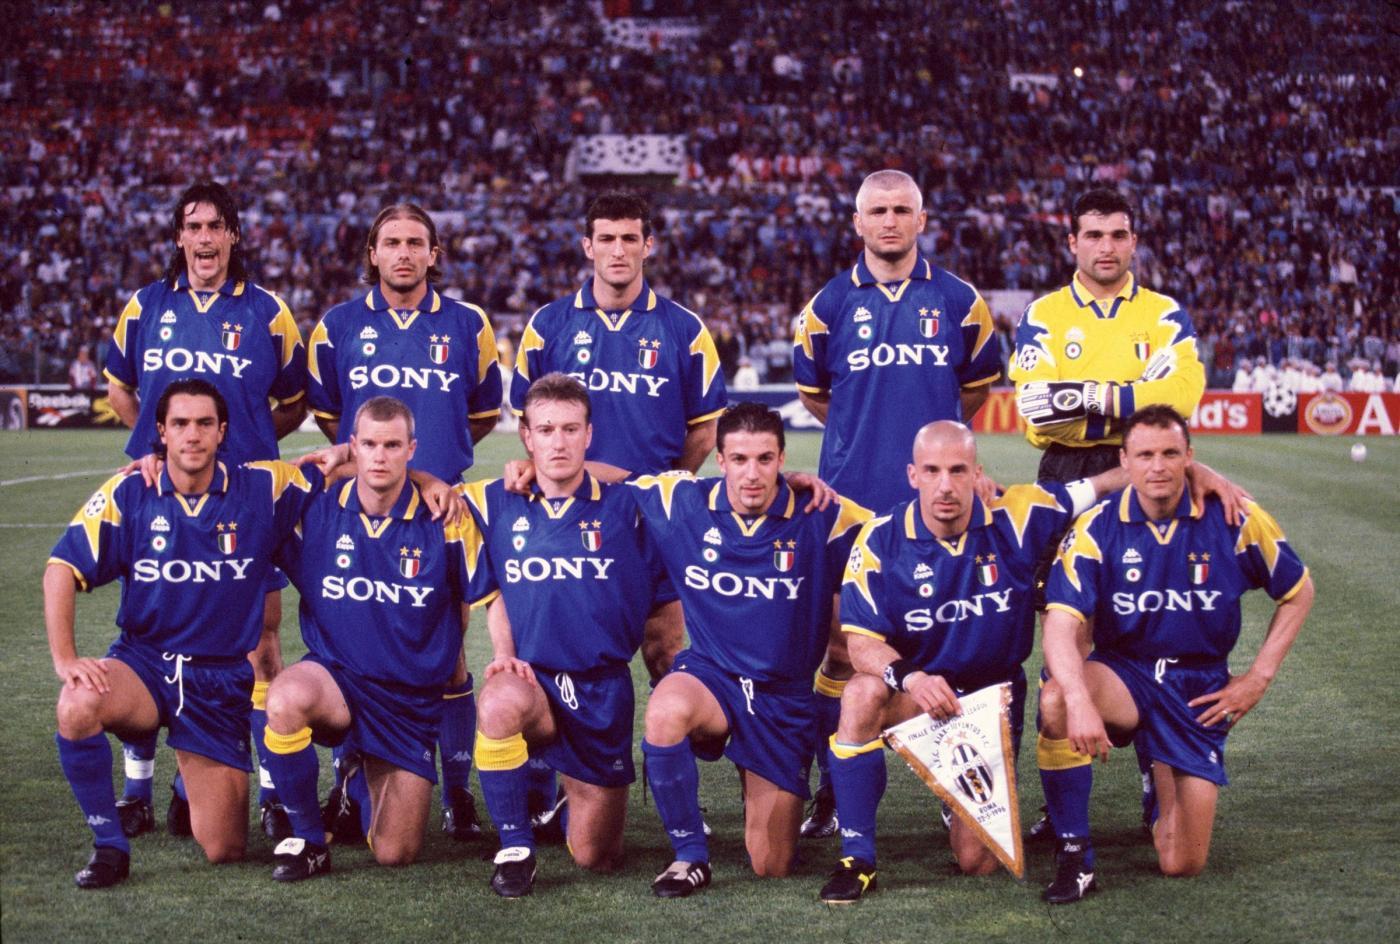 https://upload.wikimedia.org/wikipedia/it/0/0d/Juventus_FC_-_Finale_Champions_League_1995-96.jpg